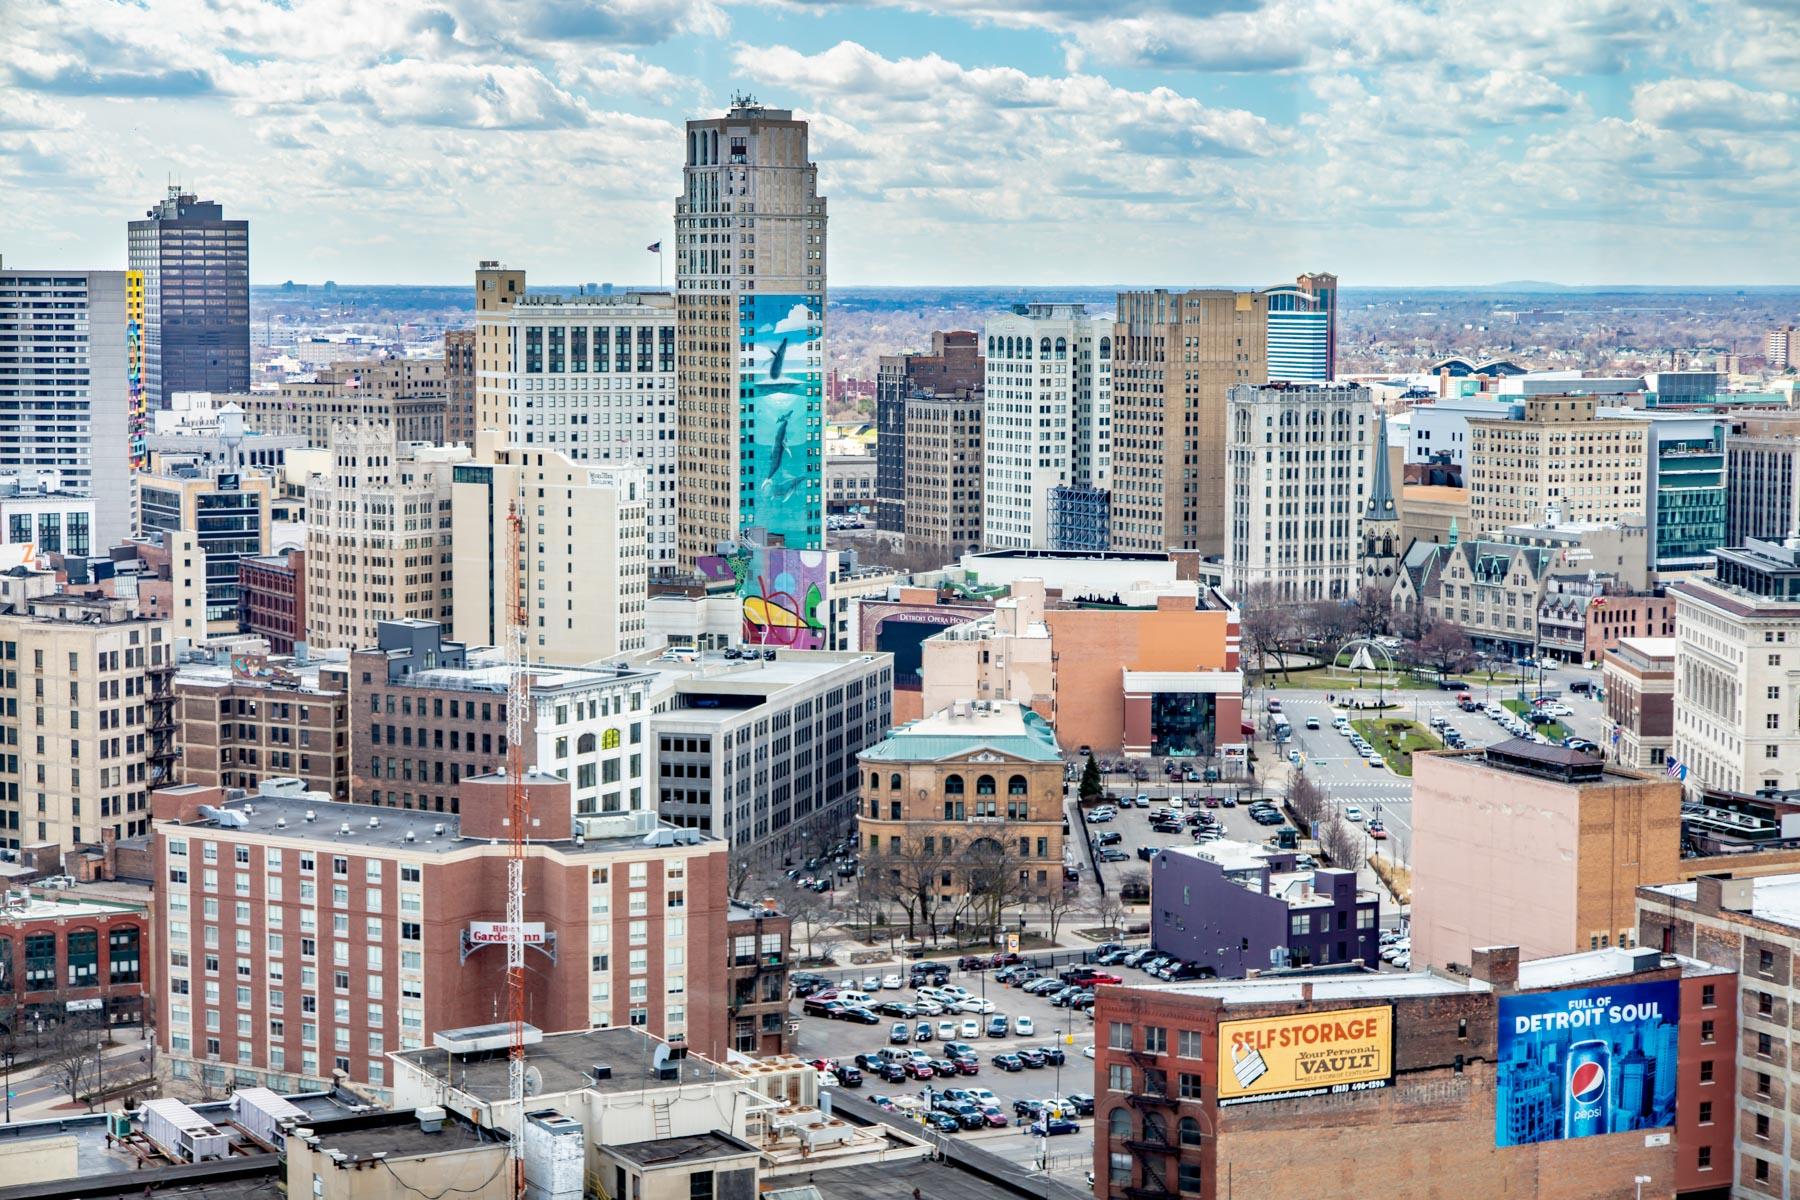 City pics GtCH Rooftop - 1z3a7258